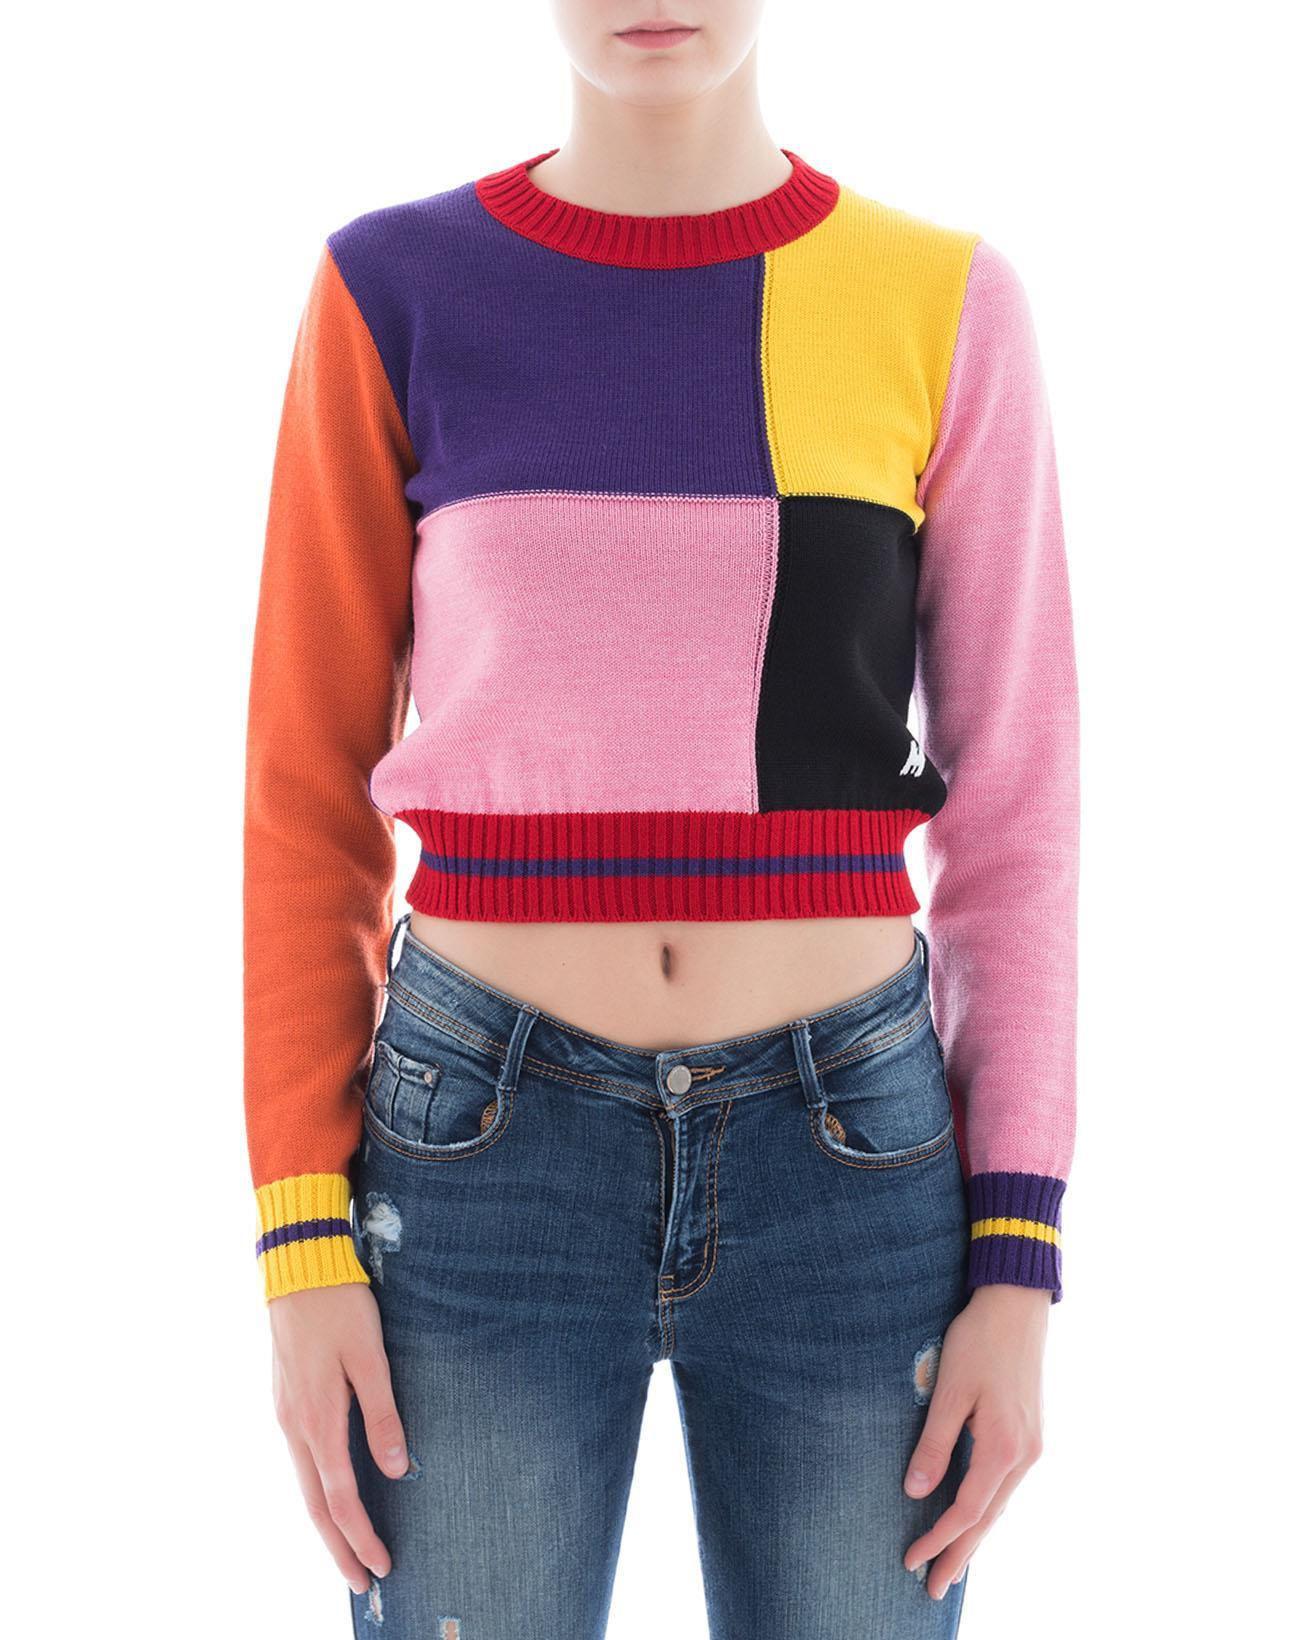 3195178df0 Lyst - Msgm Women s Multicolor Wool Sweatshirt - Save 1.631701631701631%